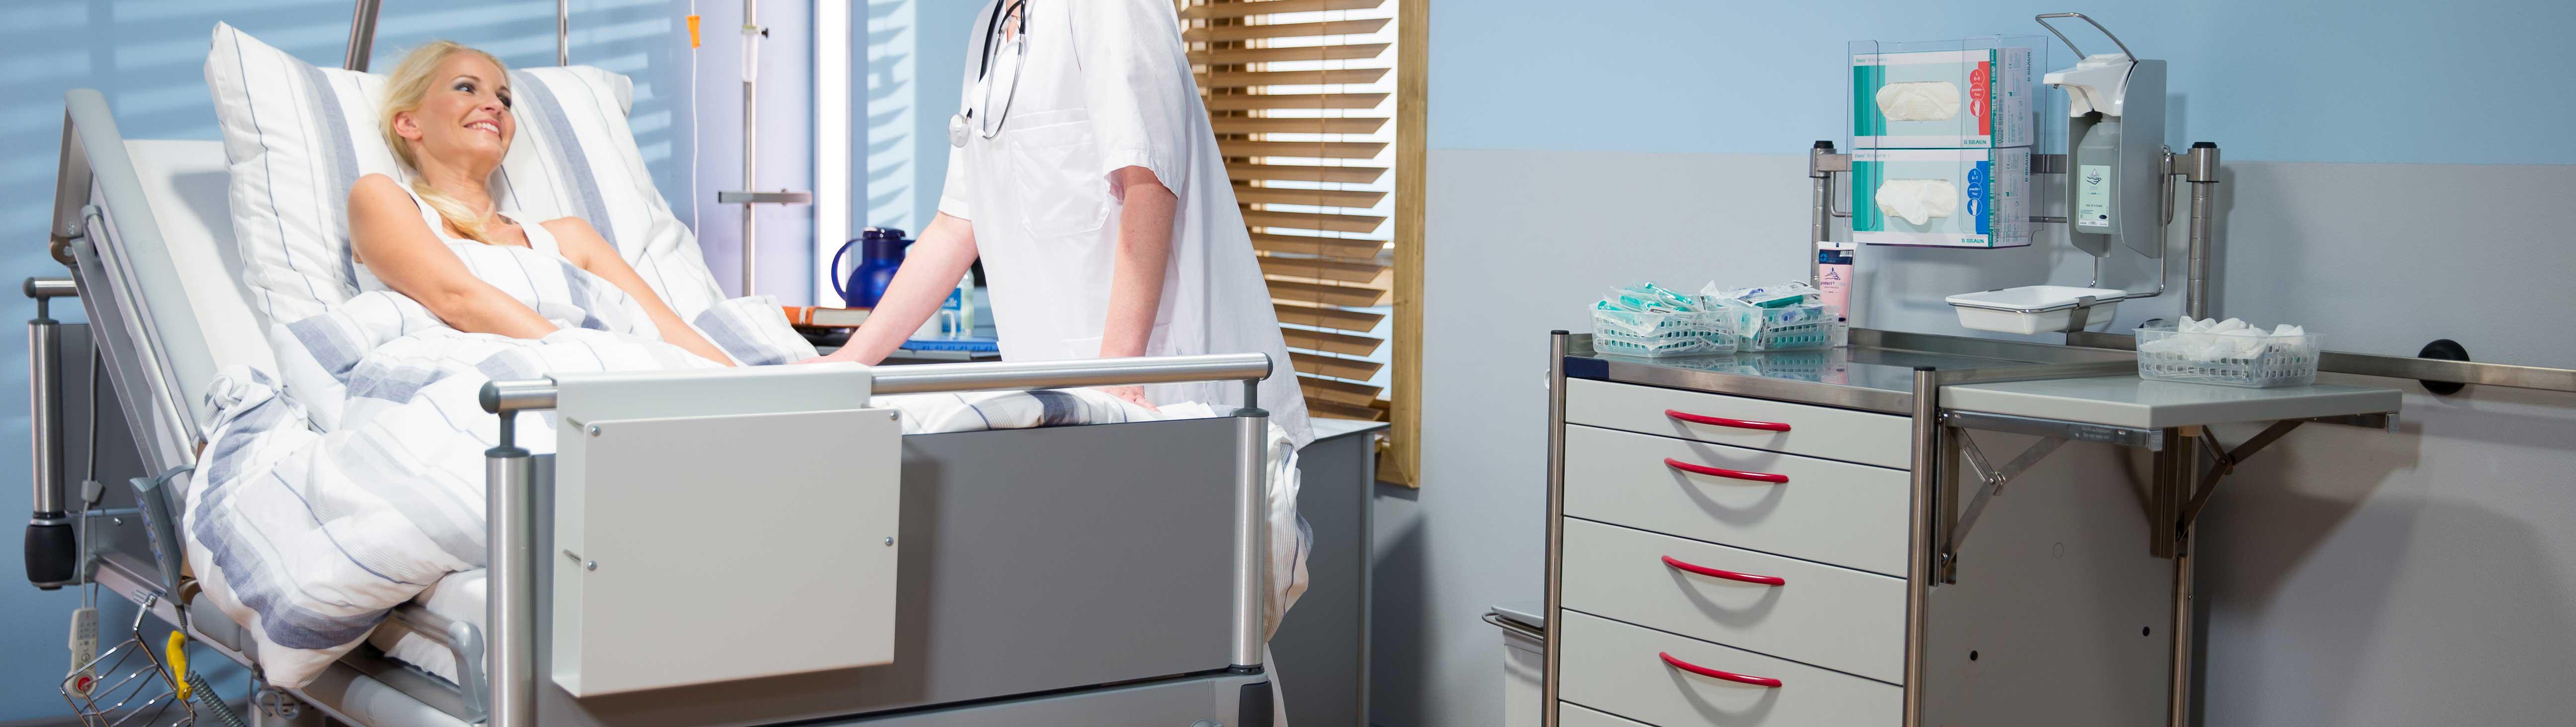 Pflegemodulwagen aus Edelstahl (PME)